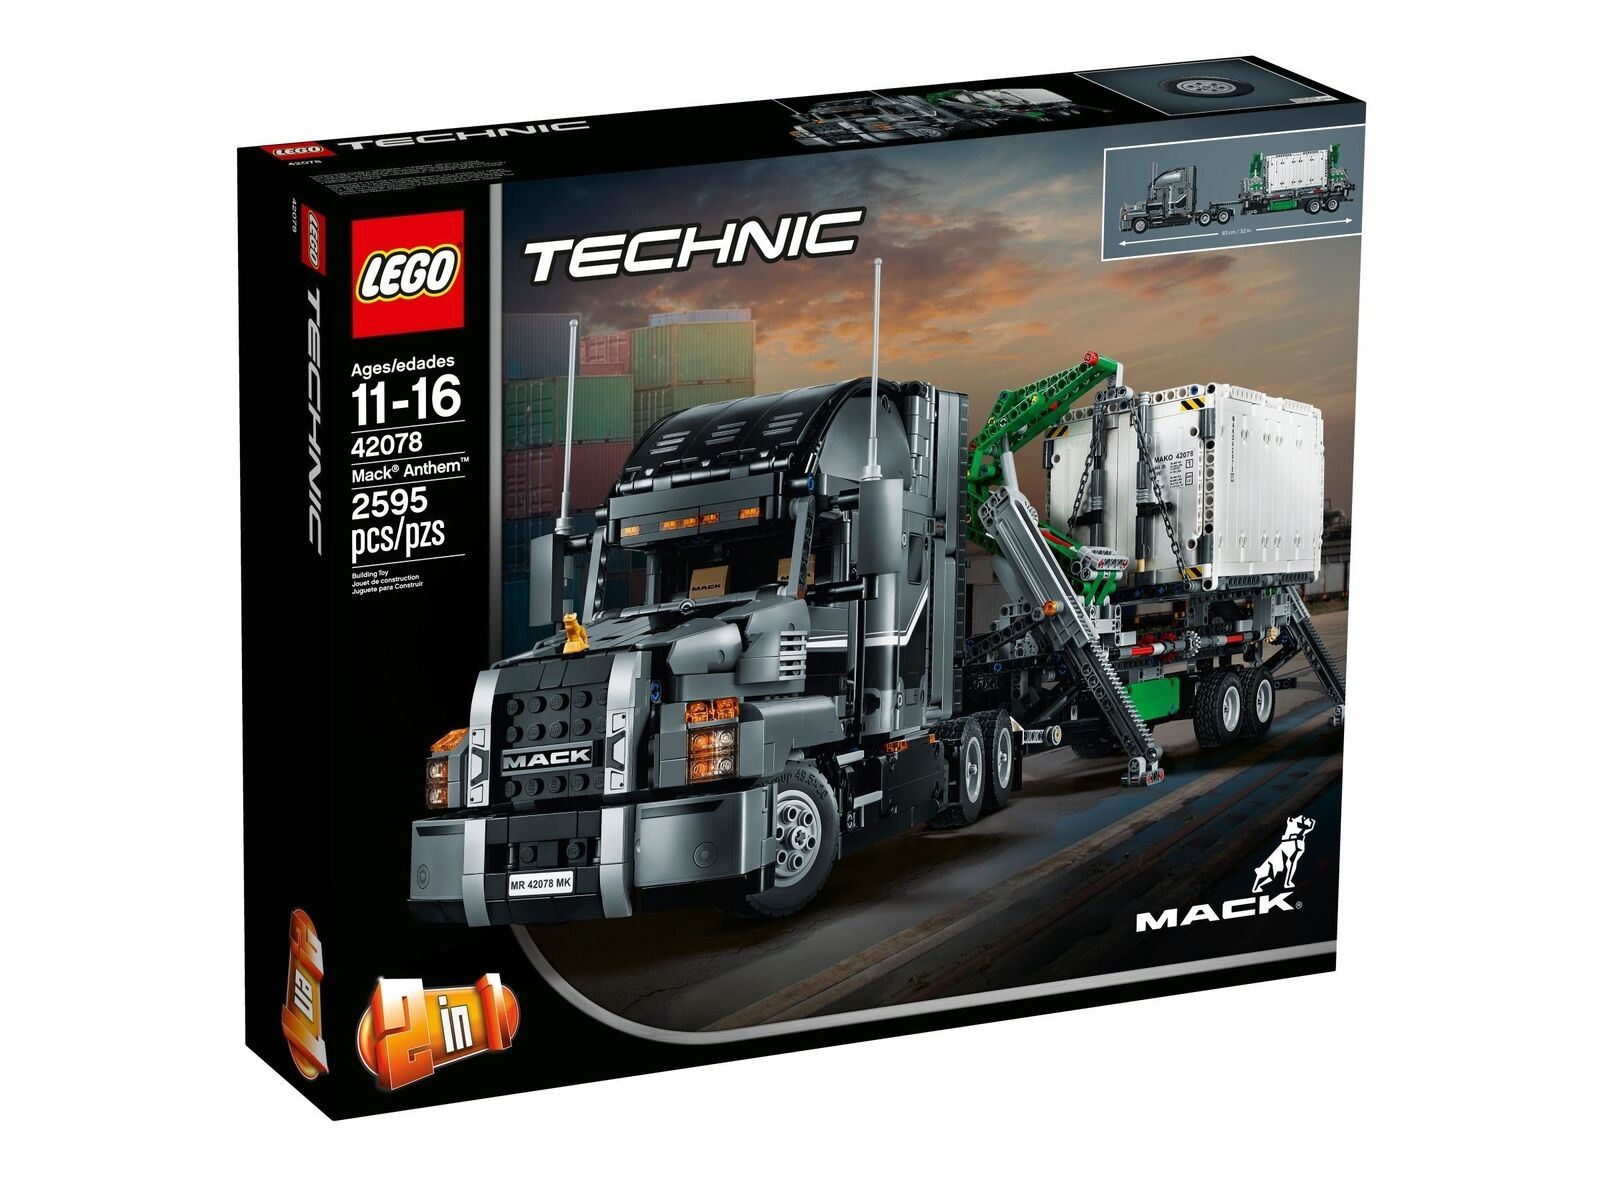 Lego Technic ® ™ 42078 mack Anthem nuevo New OVP misb